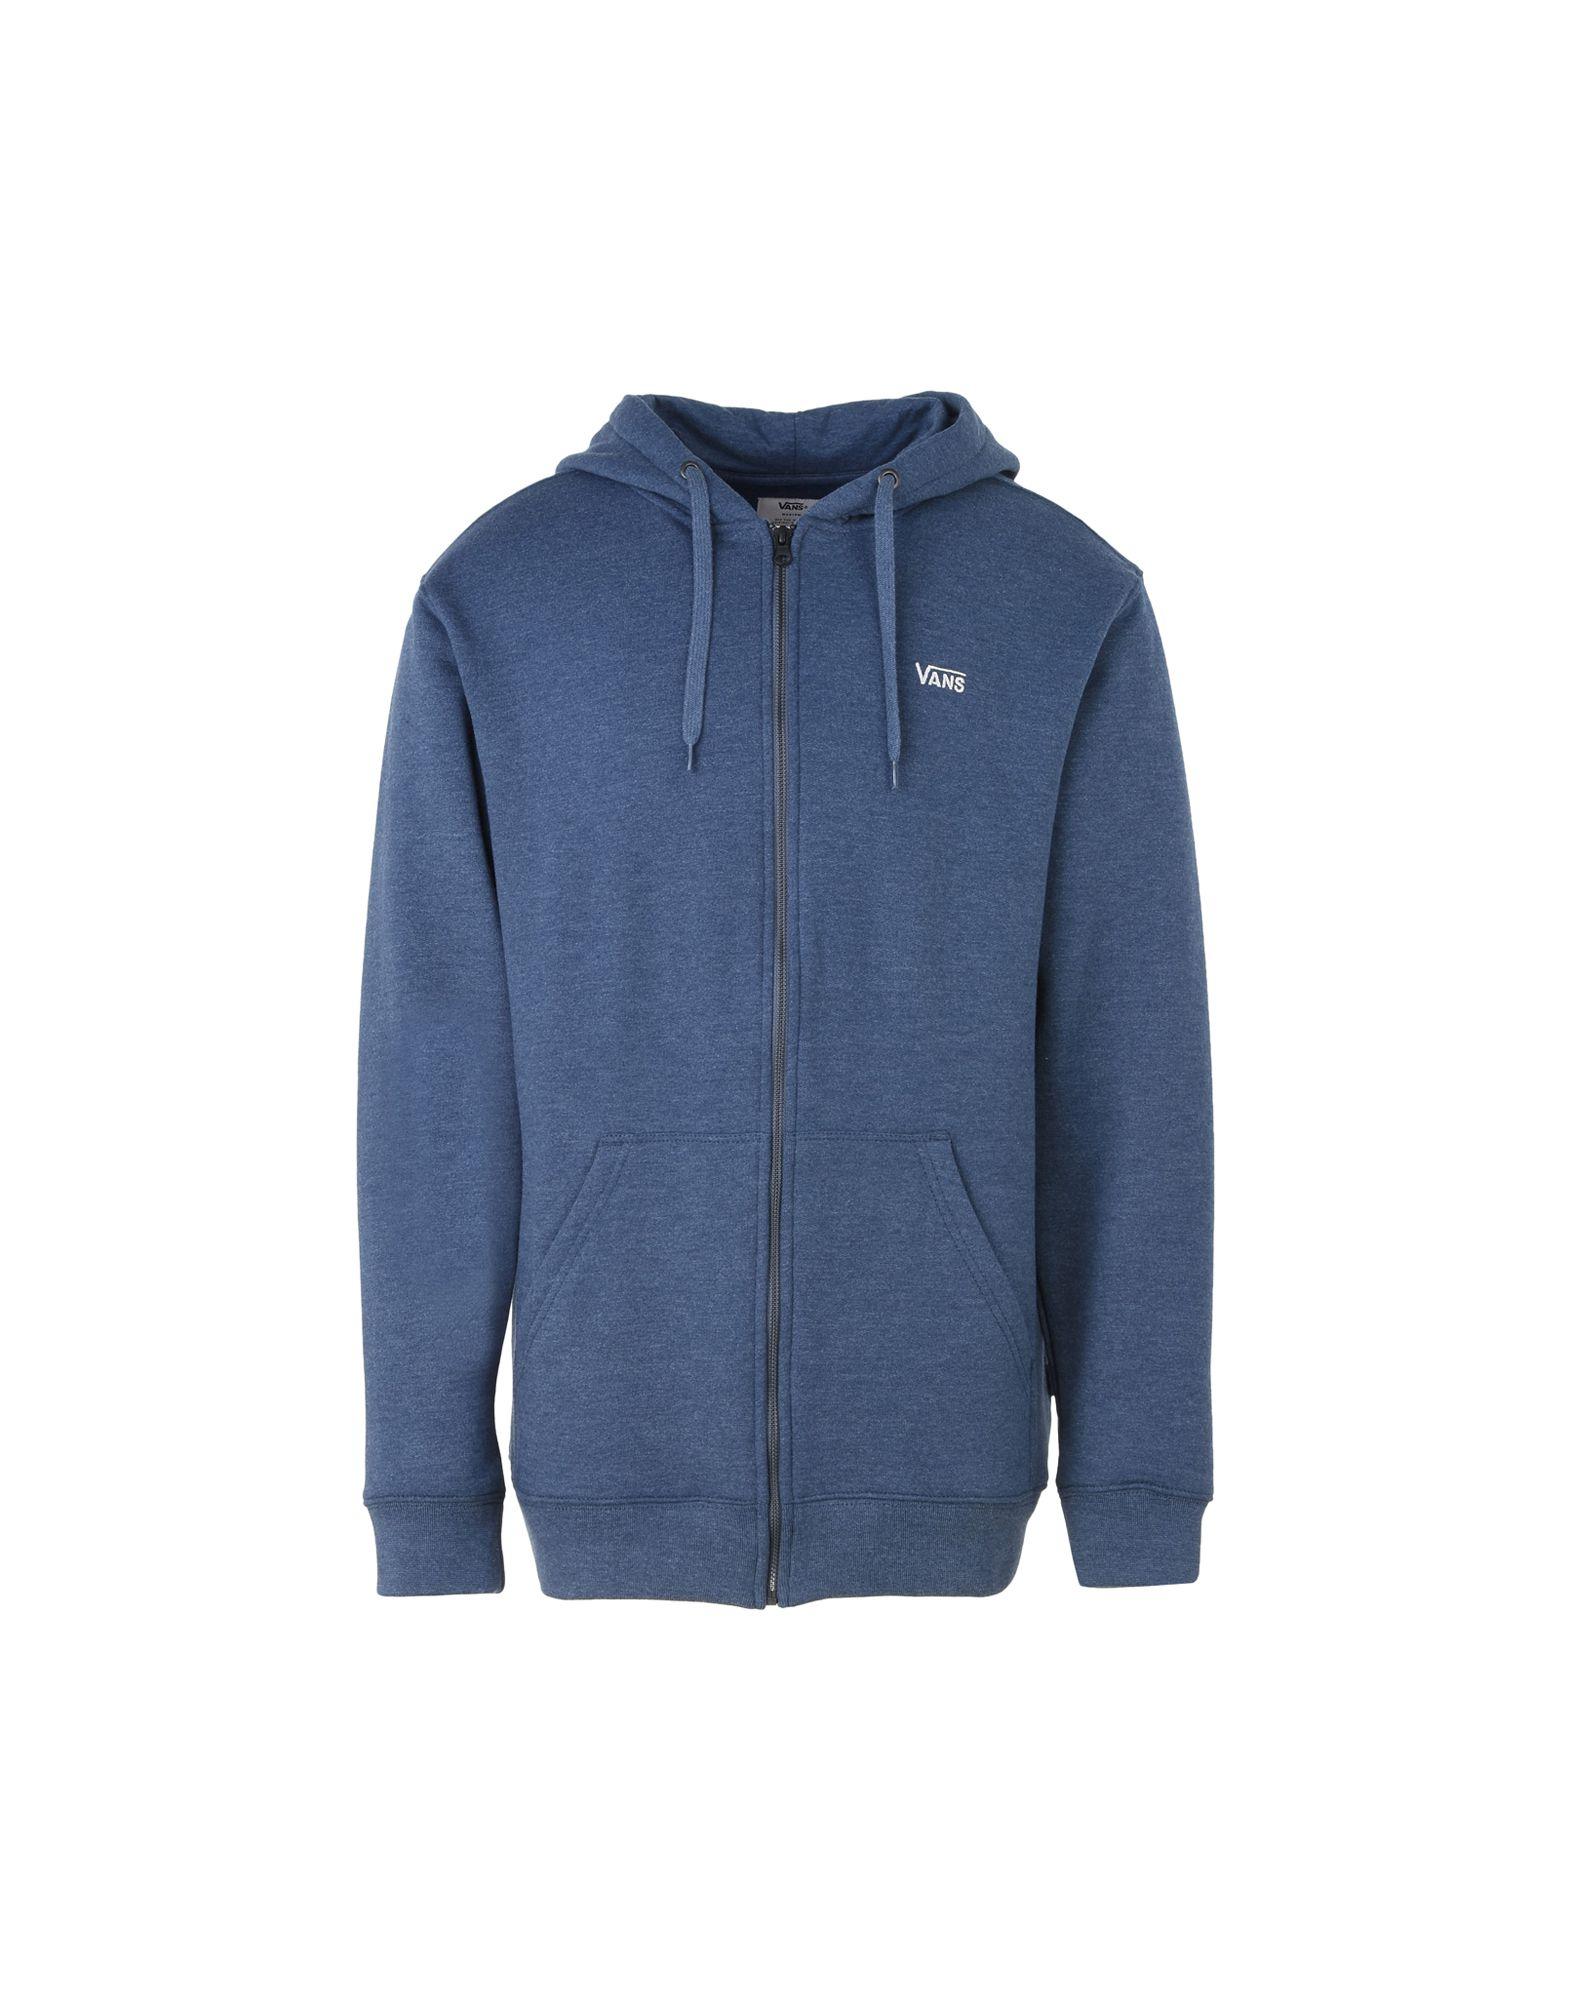 db115769ff Vans Sweatshirts for Men - Vans Sweaters And Sweatshirts